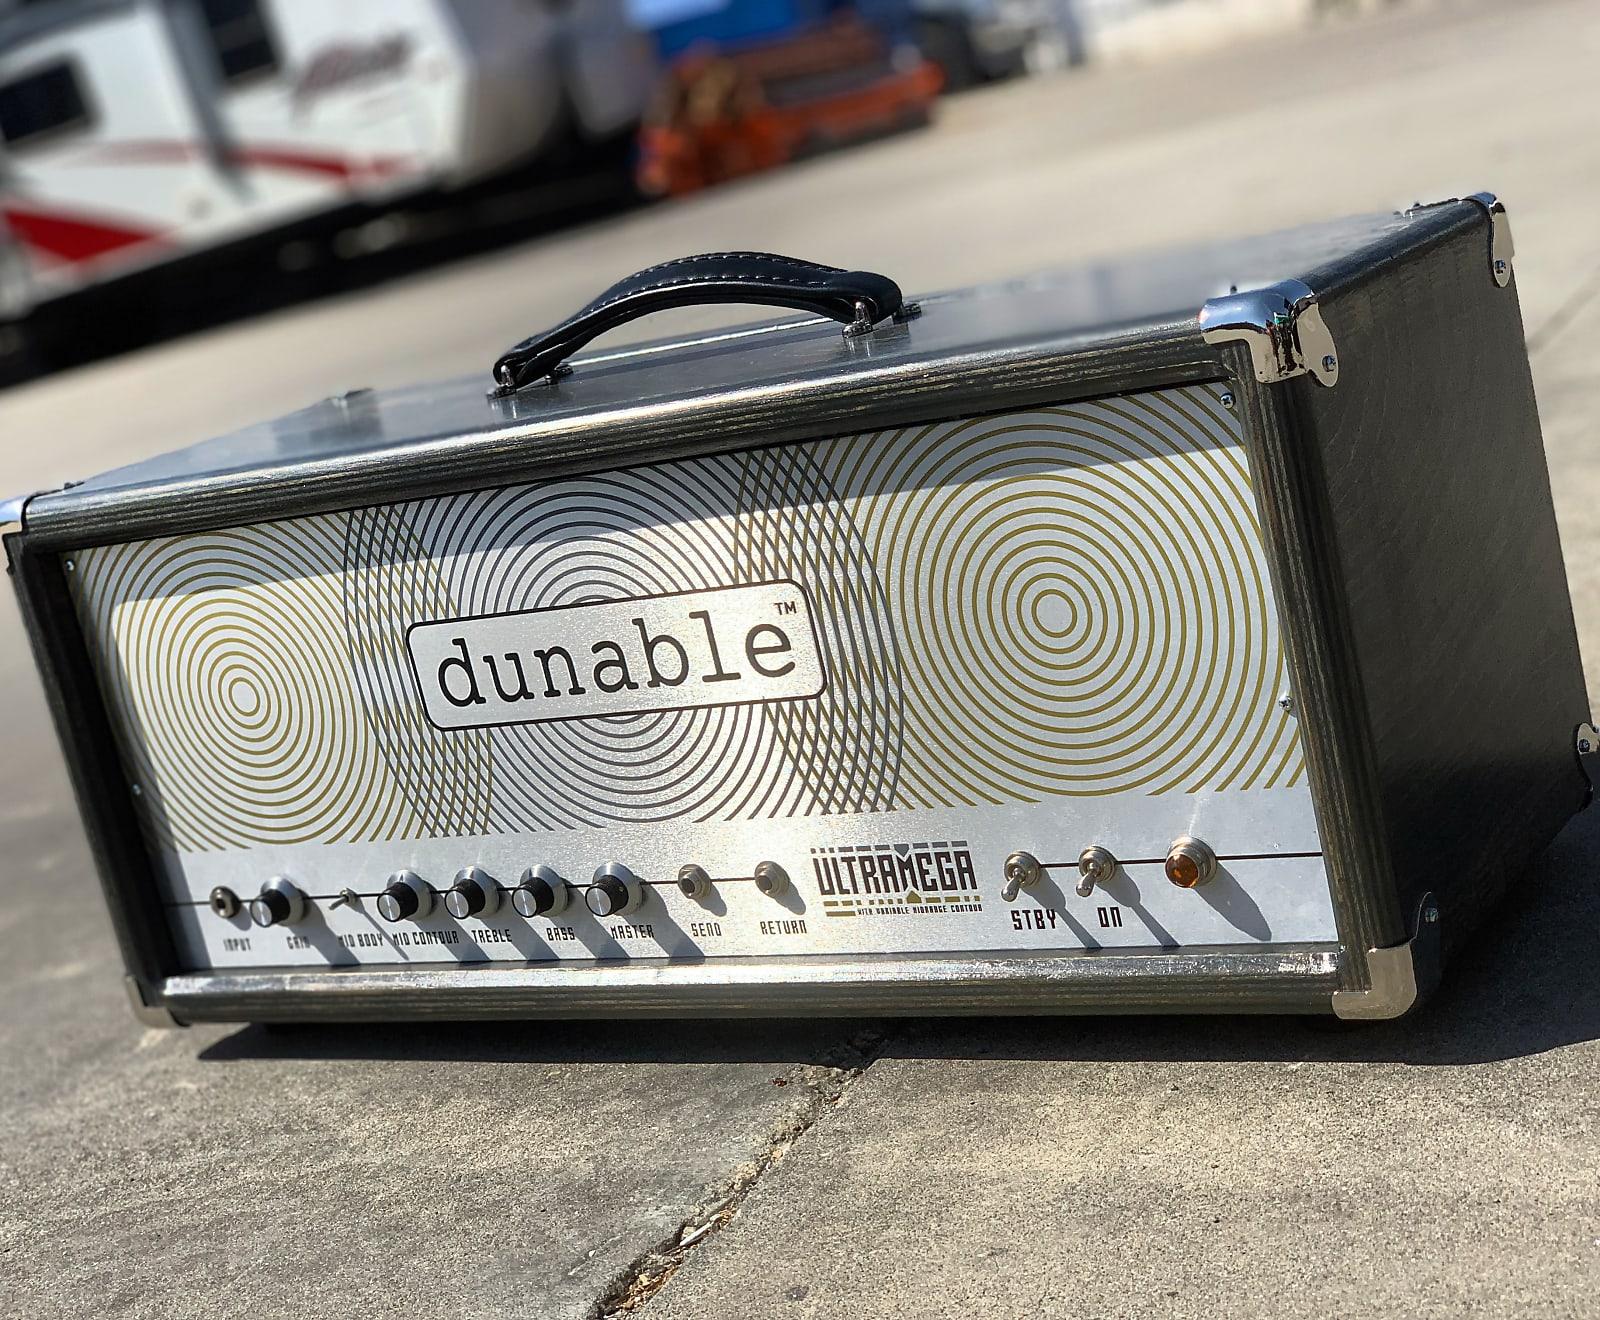 Dunable Ultramega Amplifier 2019 black stain